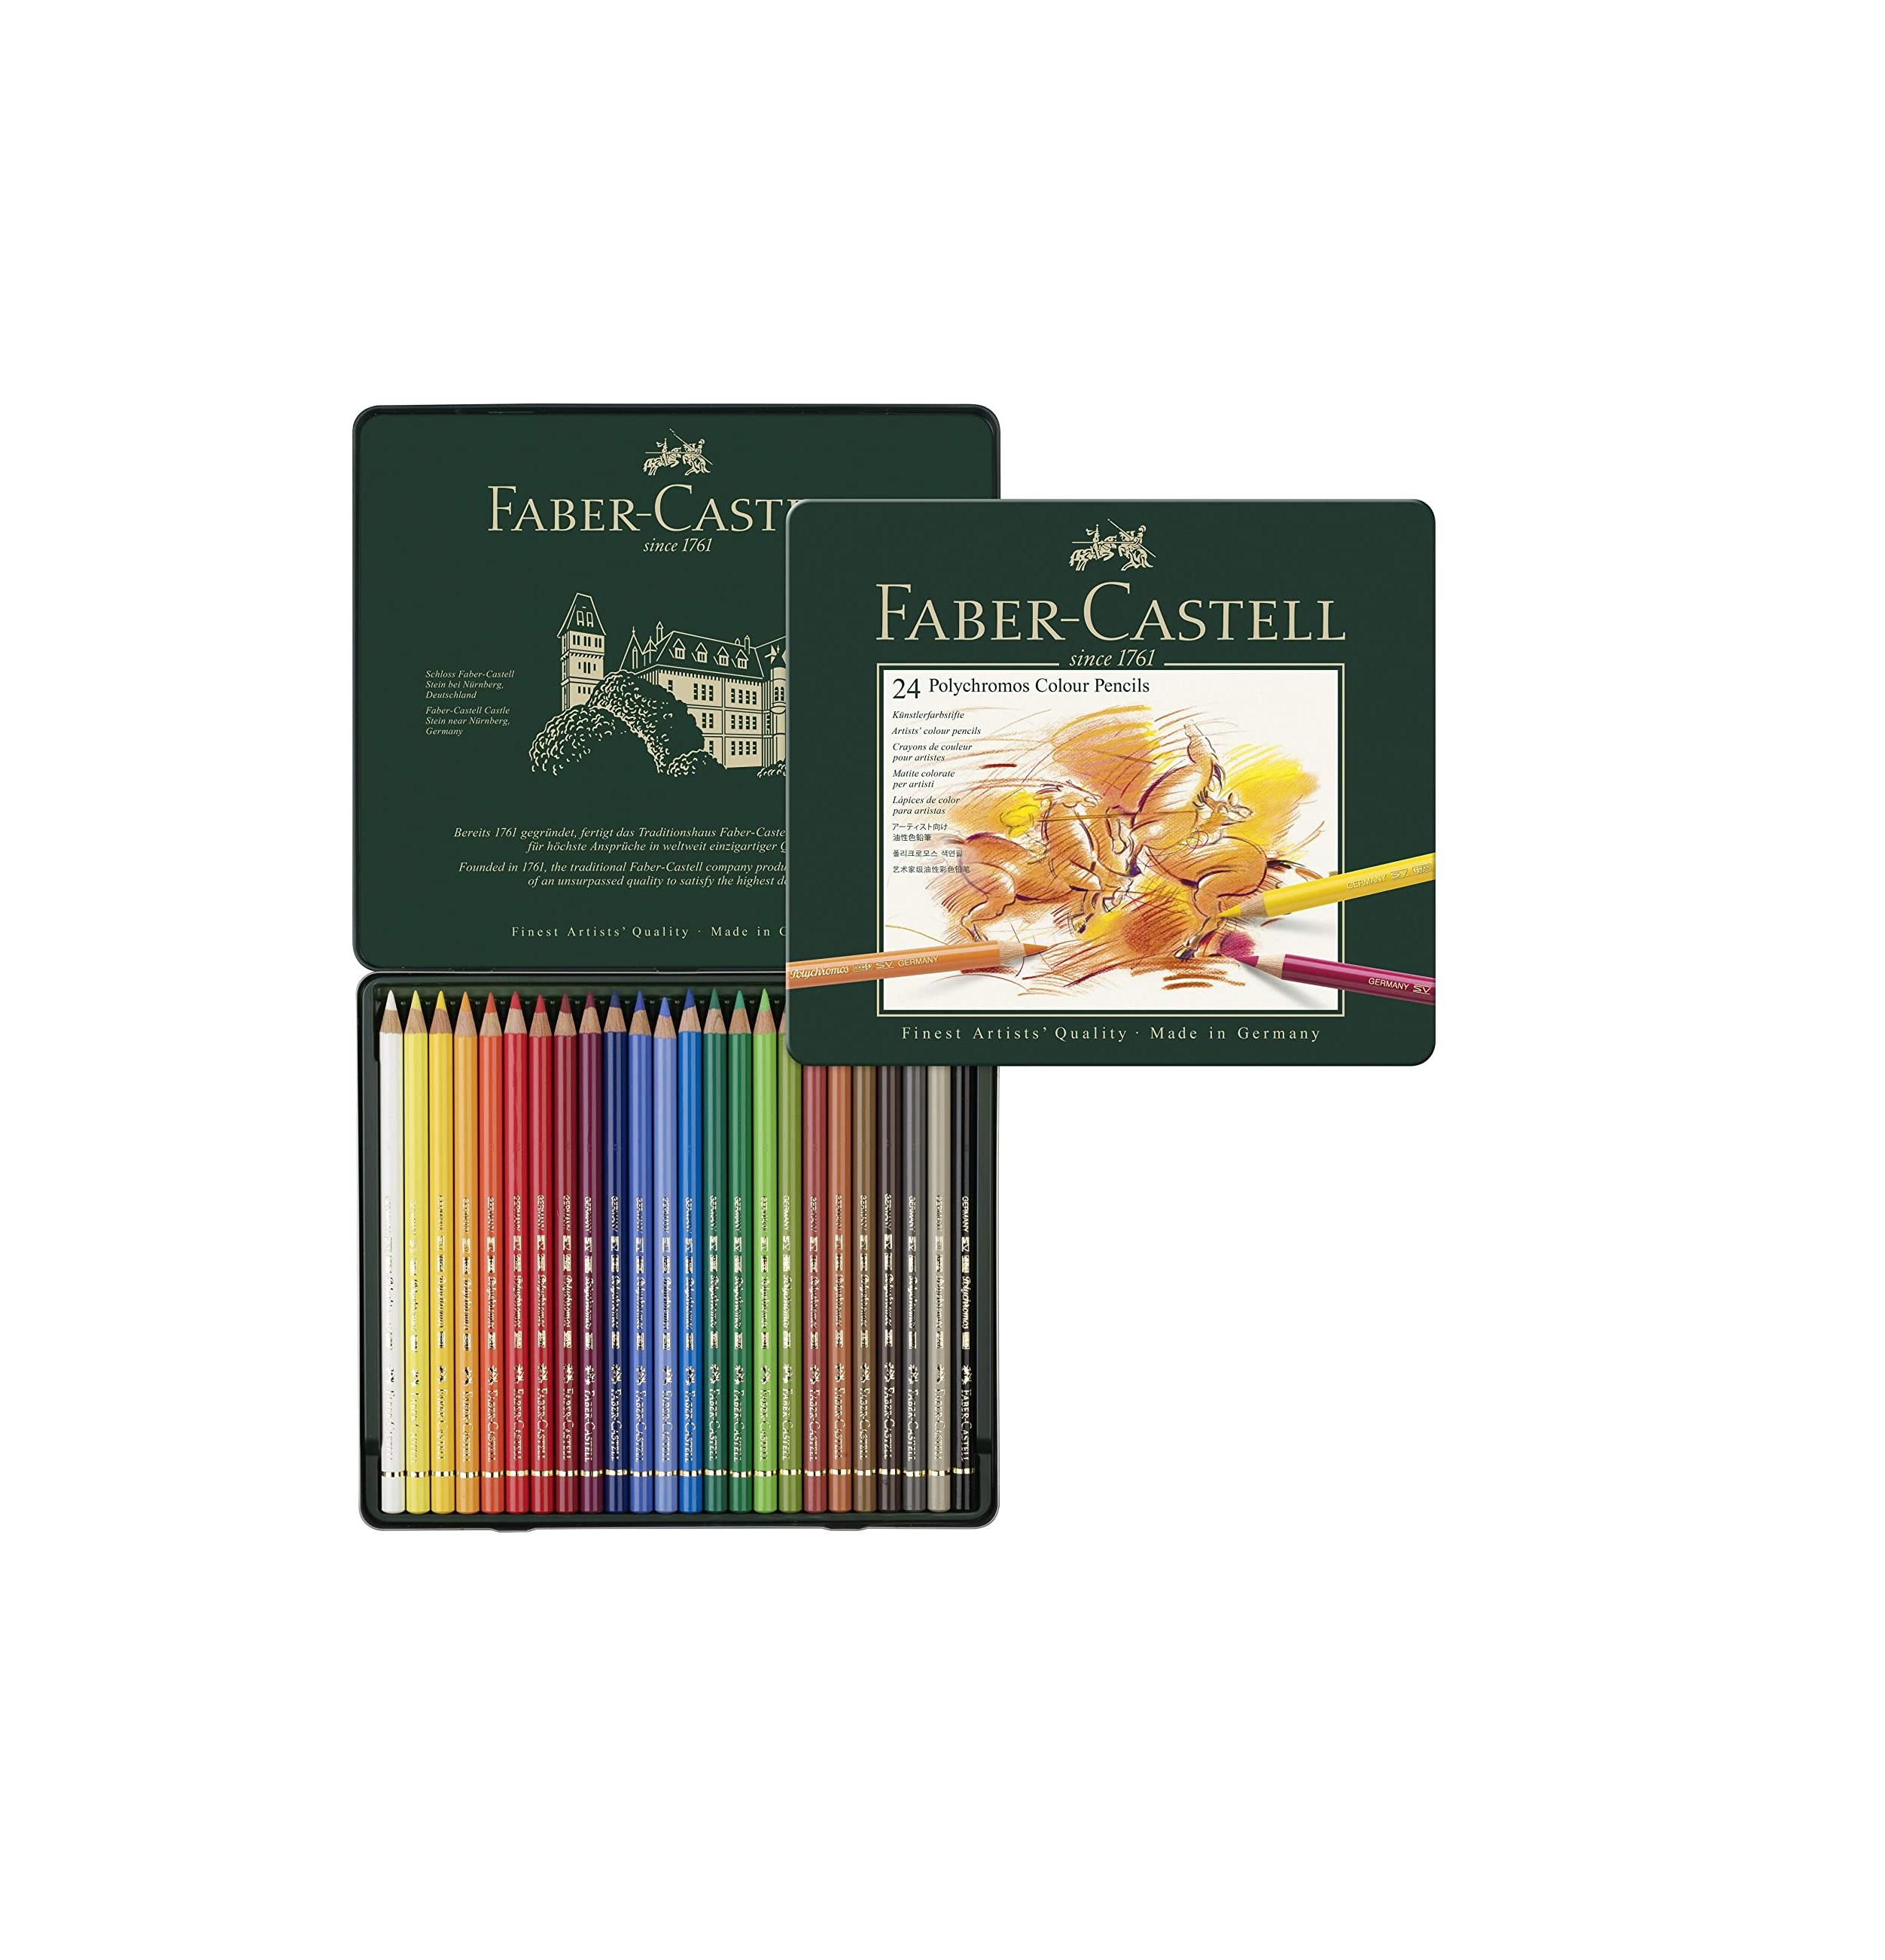 Faber-Castell Polychromos Color Pencil Set - Pack of 24